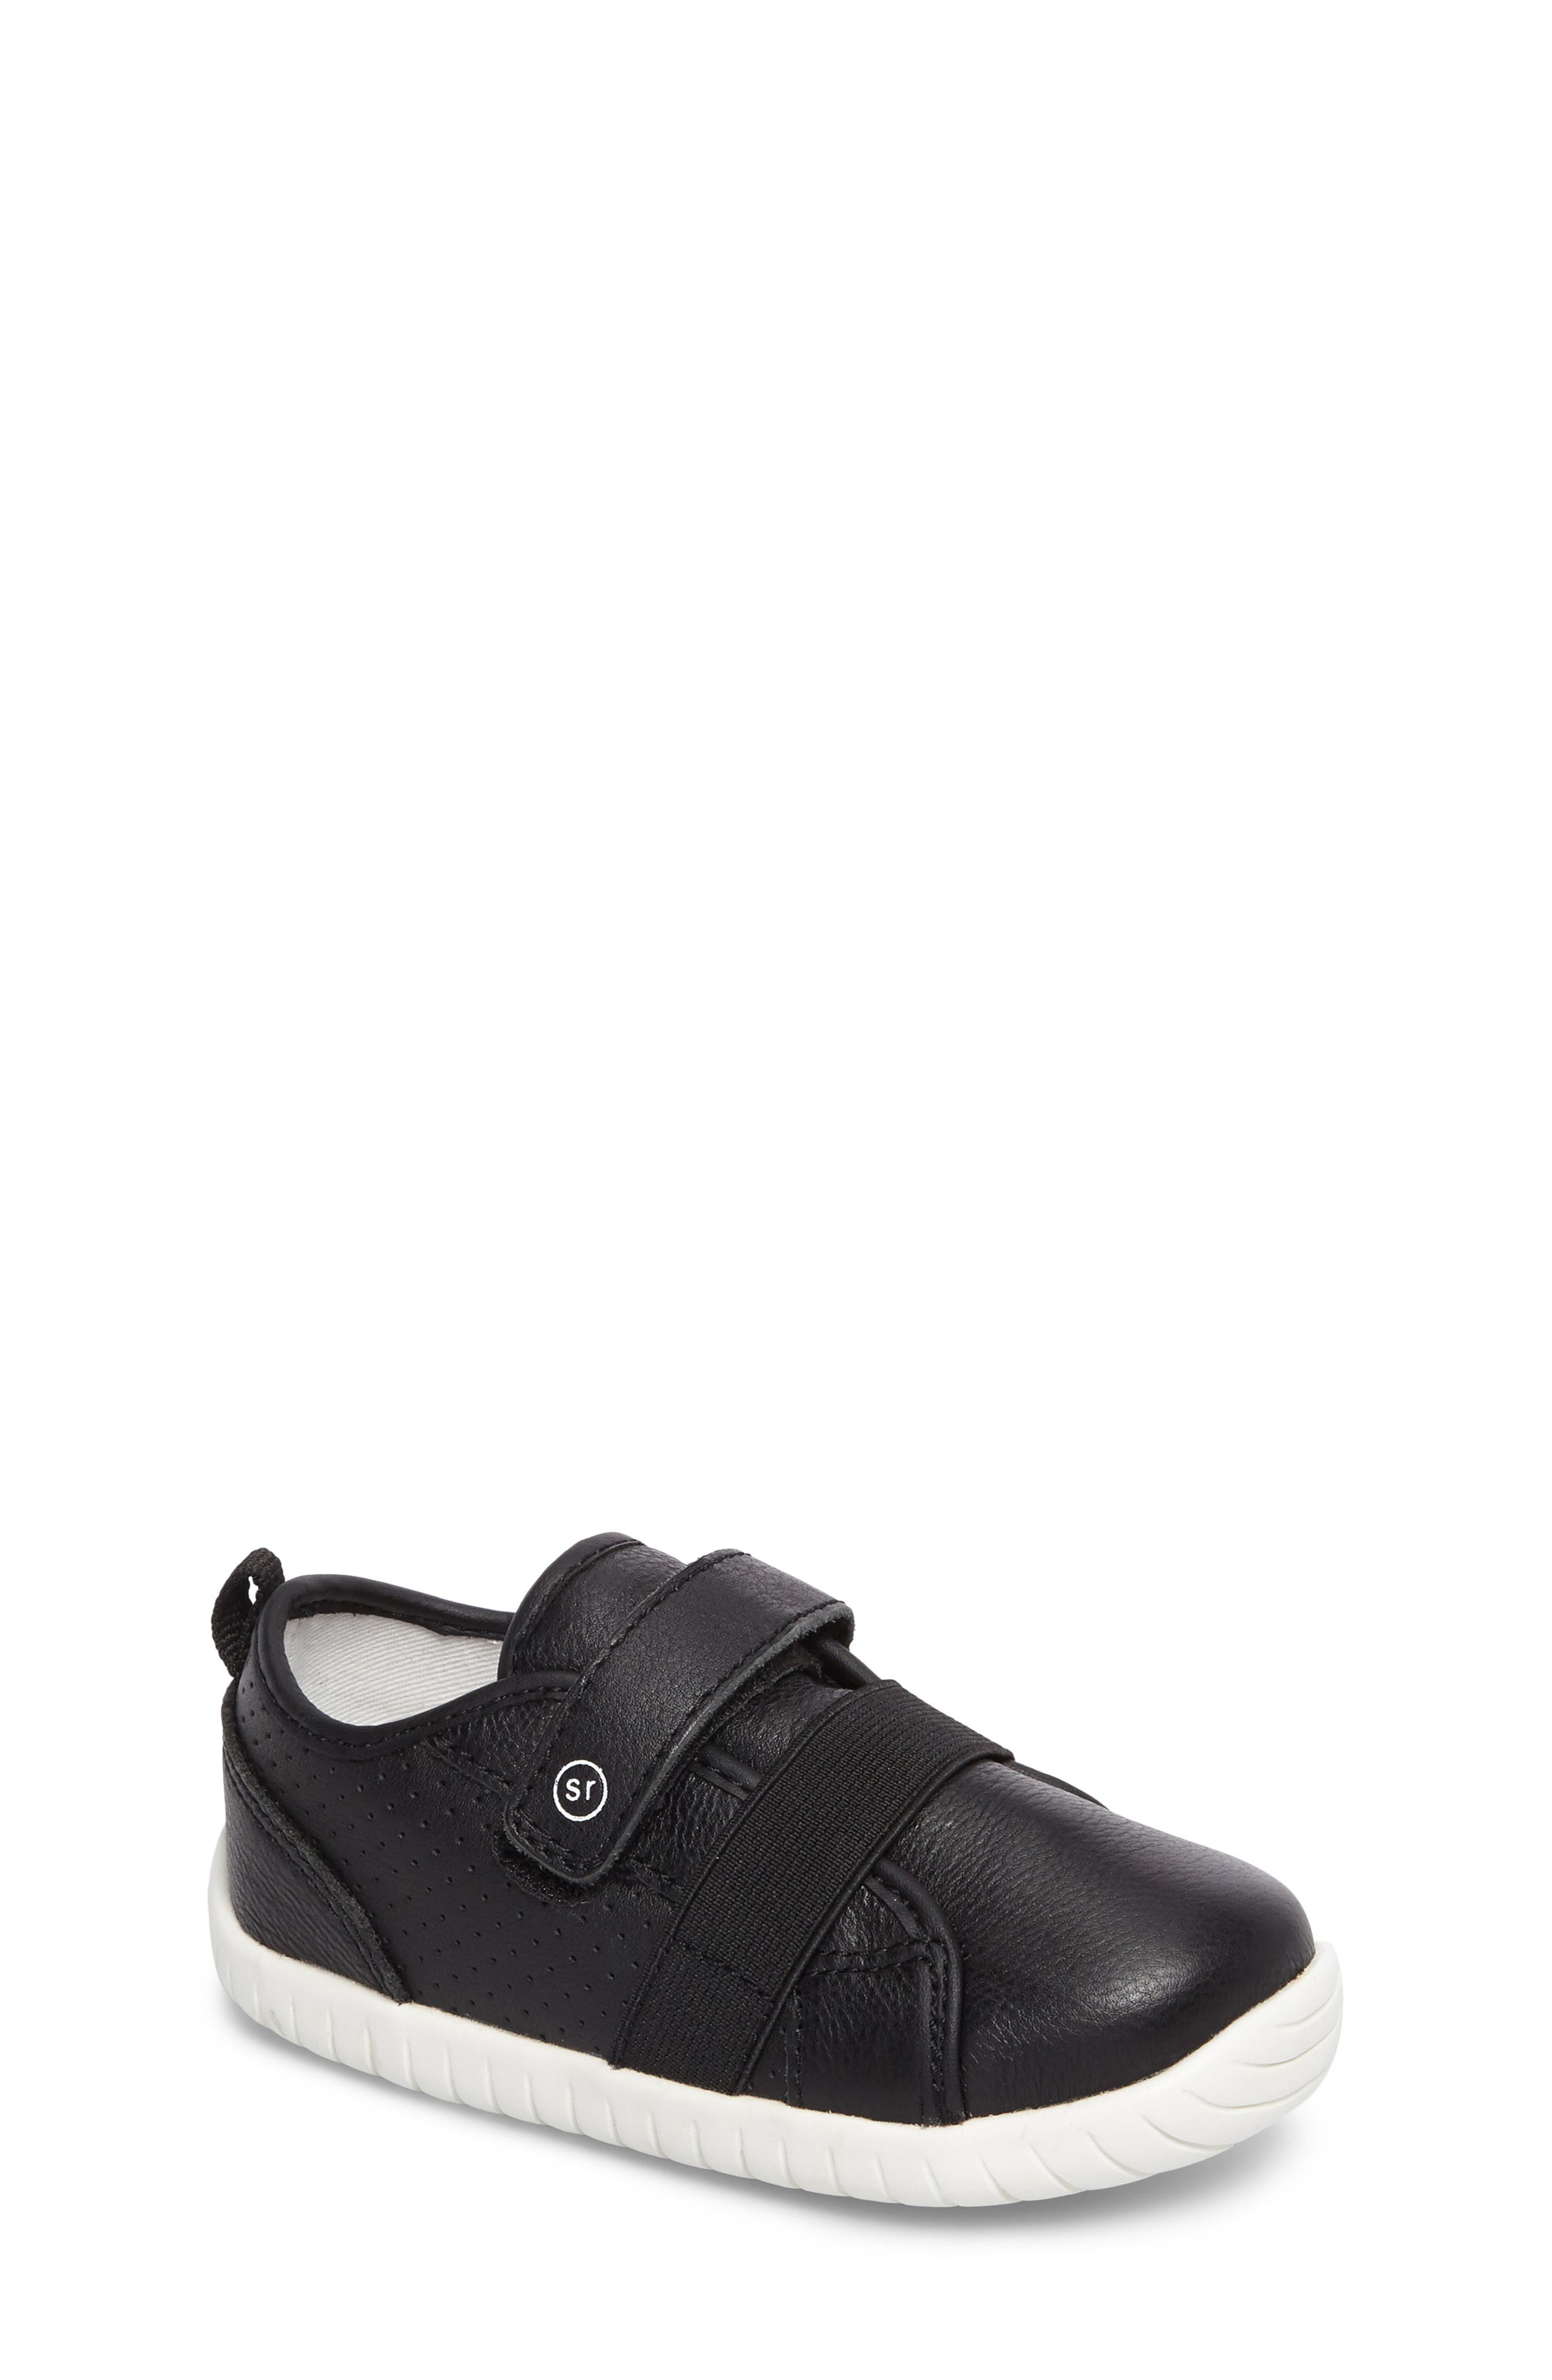 SRT Riley Sneaker,                         Main,                         color, Black Leather